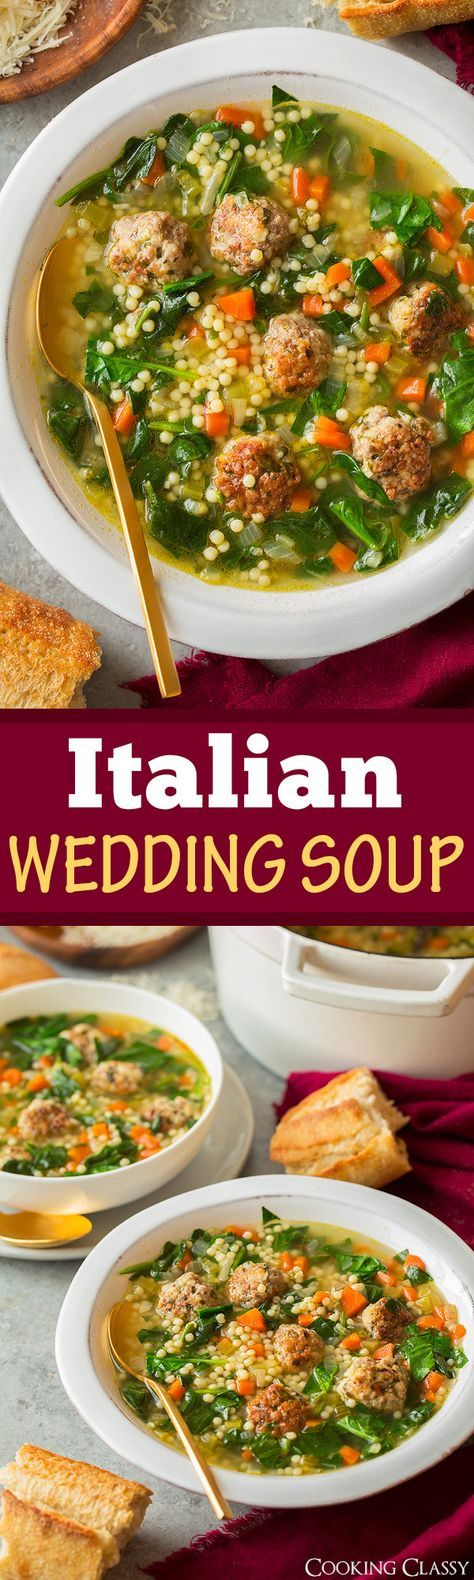 Italian Wedding Soup - Cooking Classy | Soups | Pinterest | Wedding ...